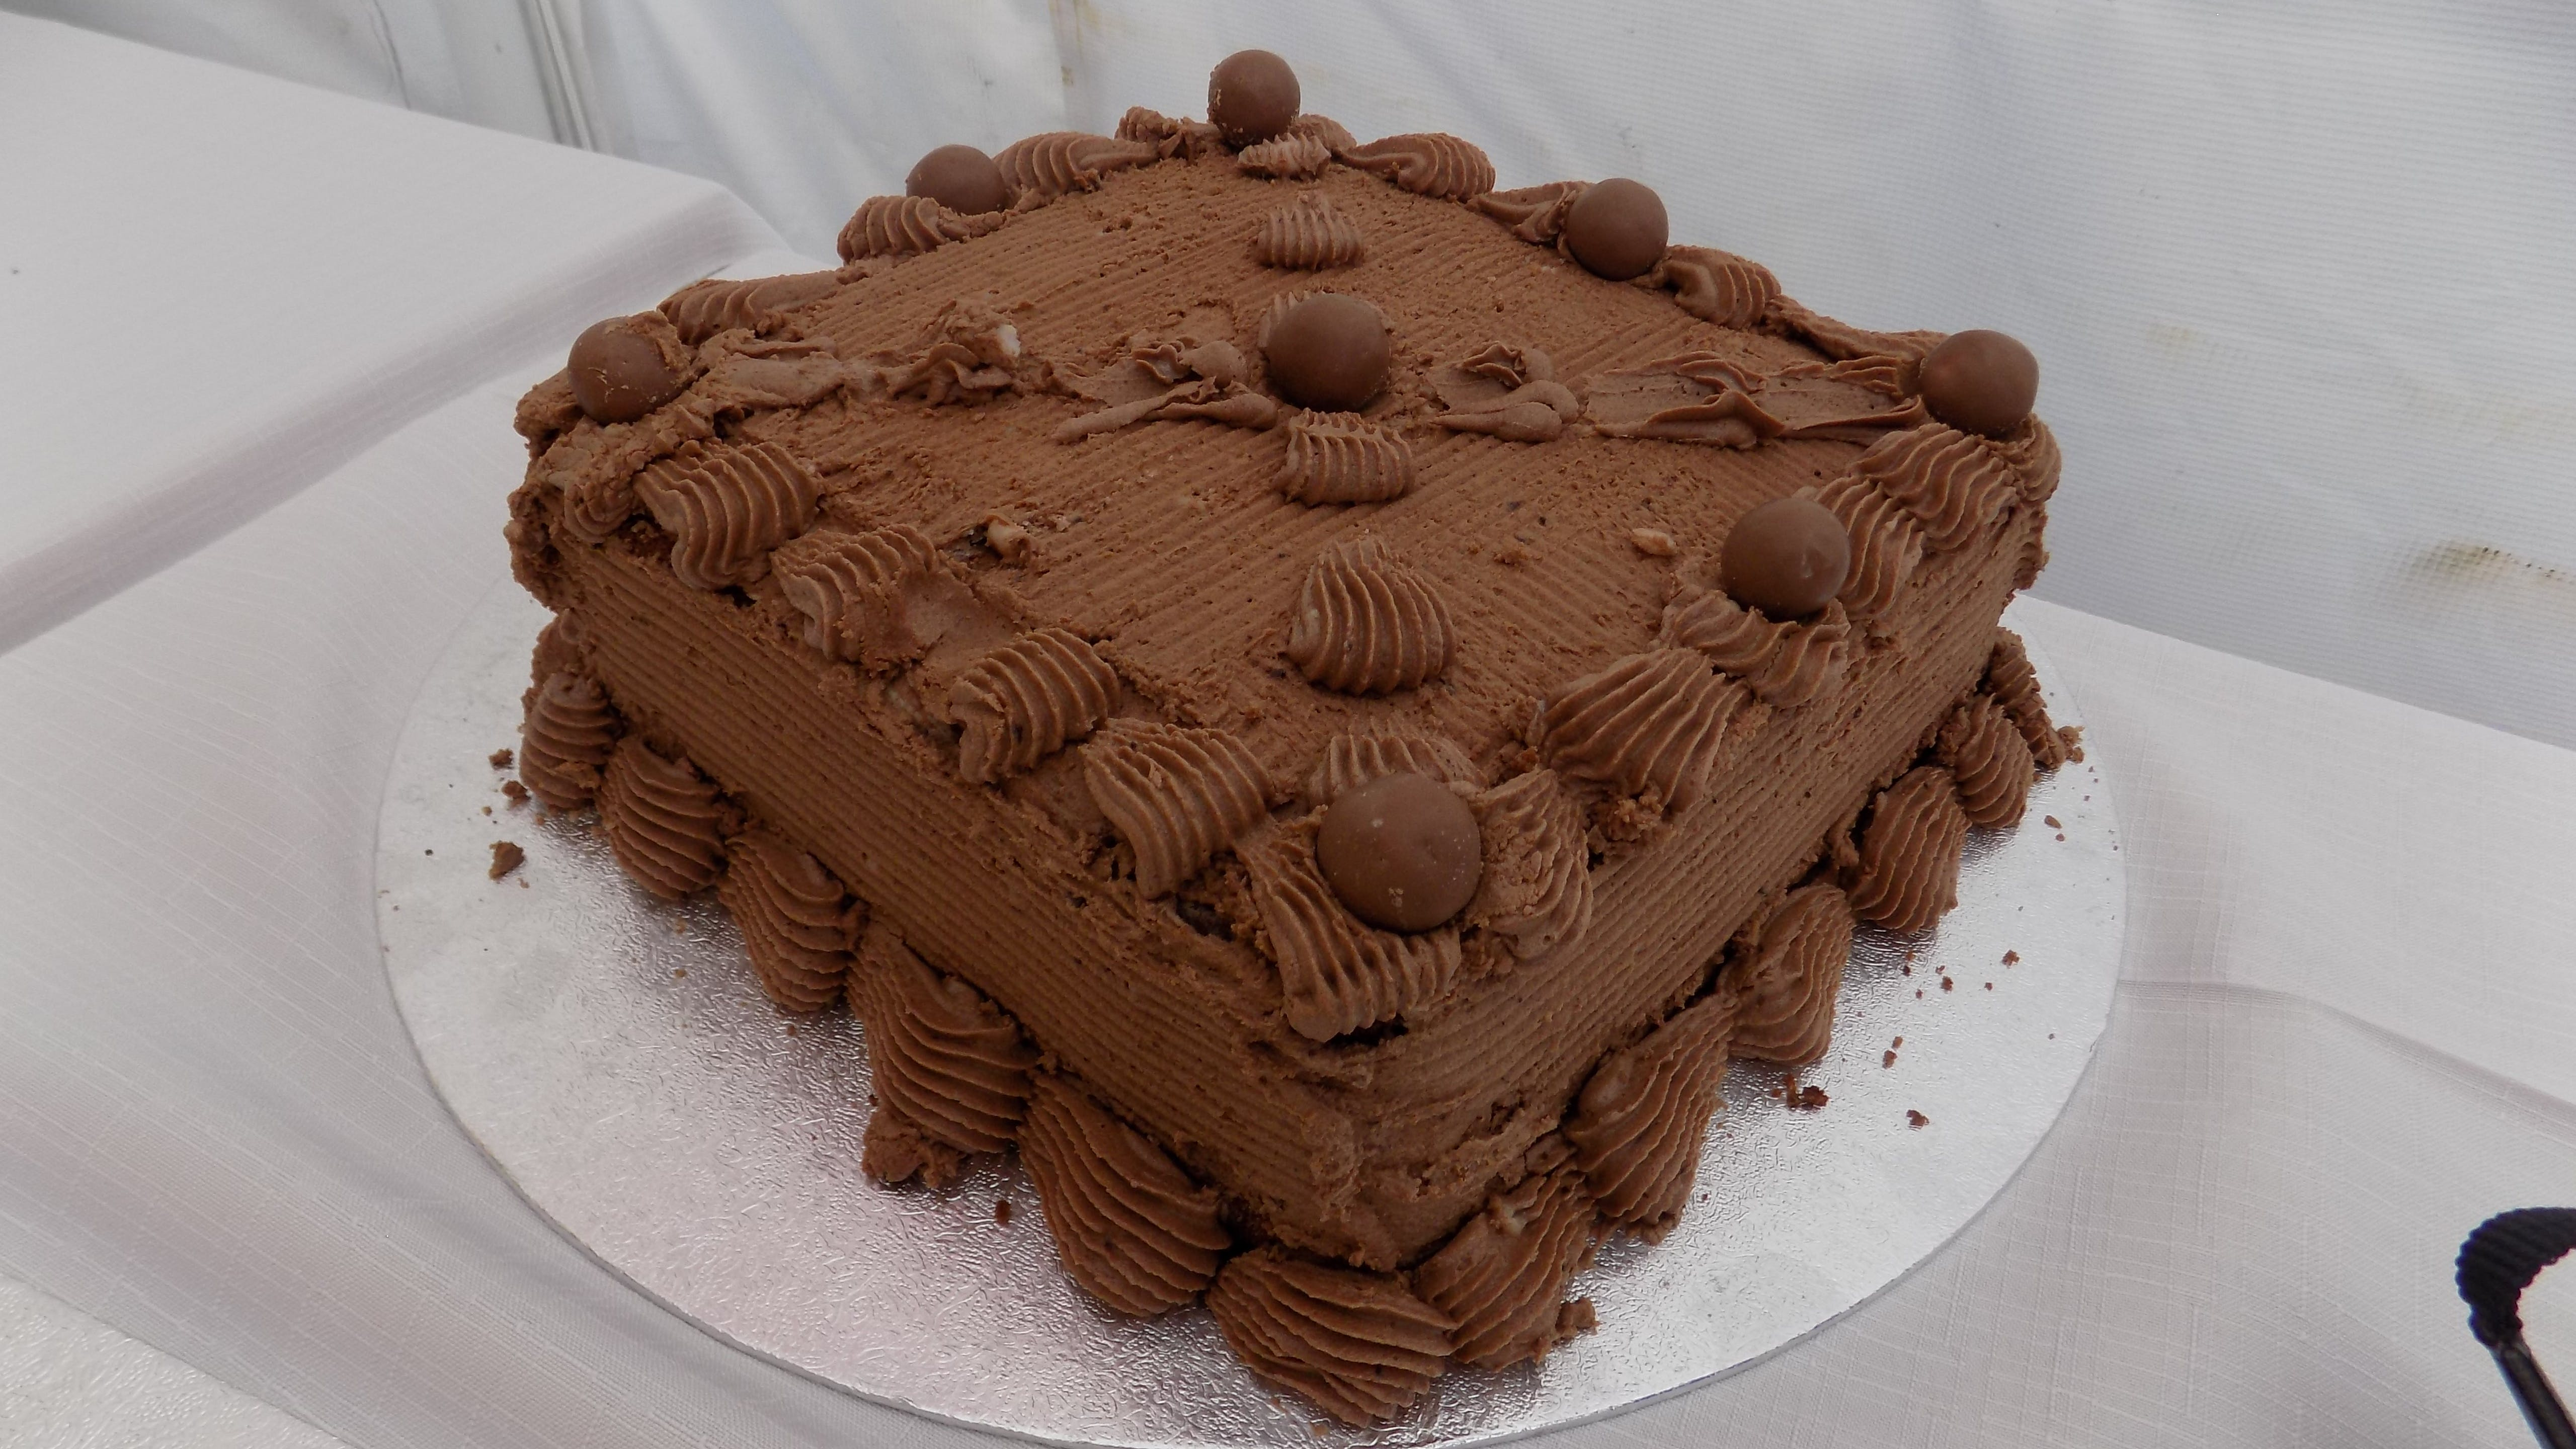 Free stock photo of cake, chocolate, chocolate cake, food